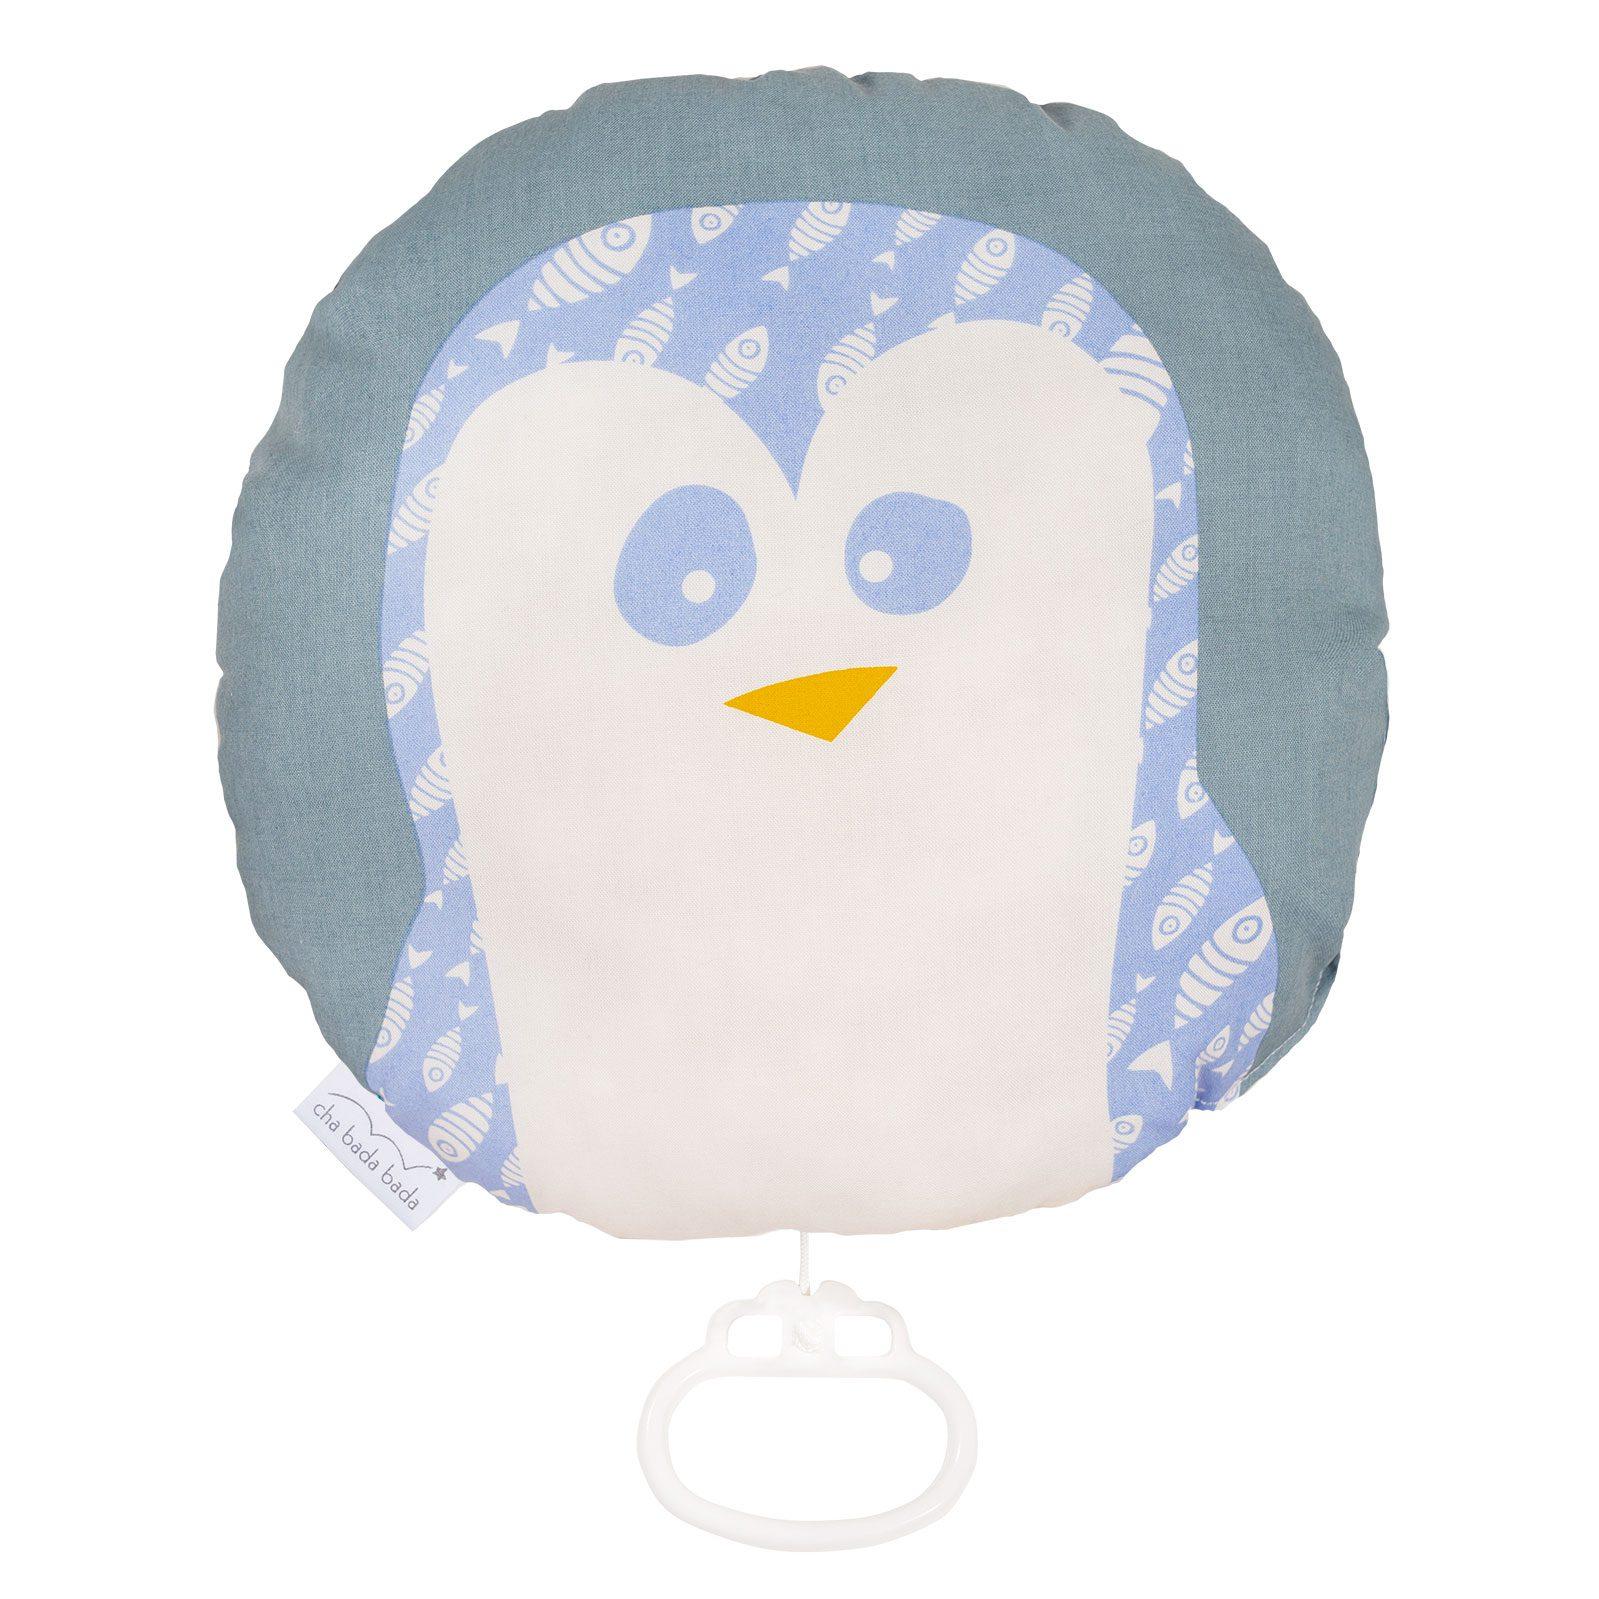 boite à musique coton bio pingouin chabadabada